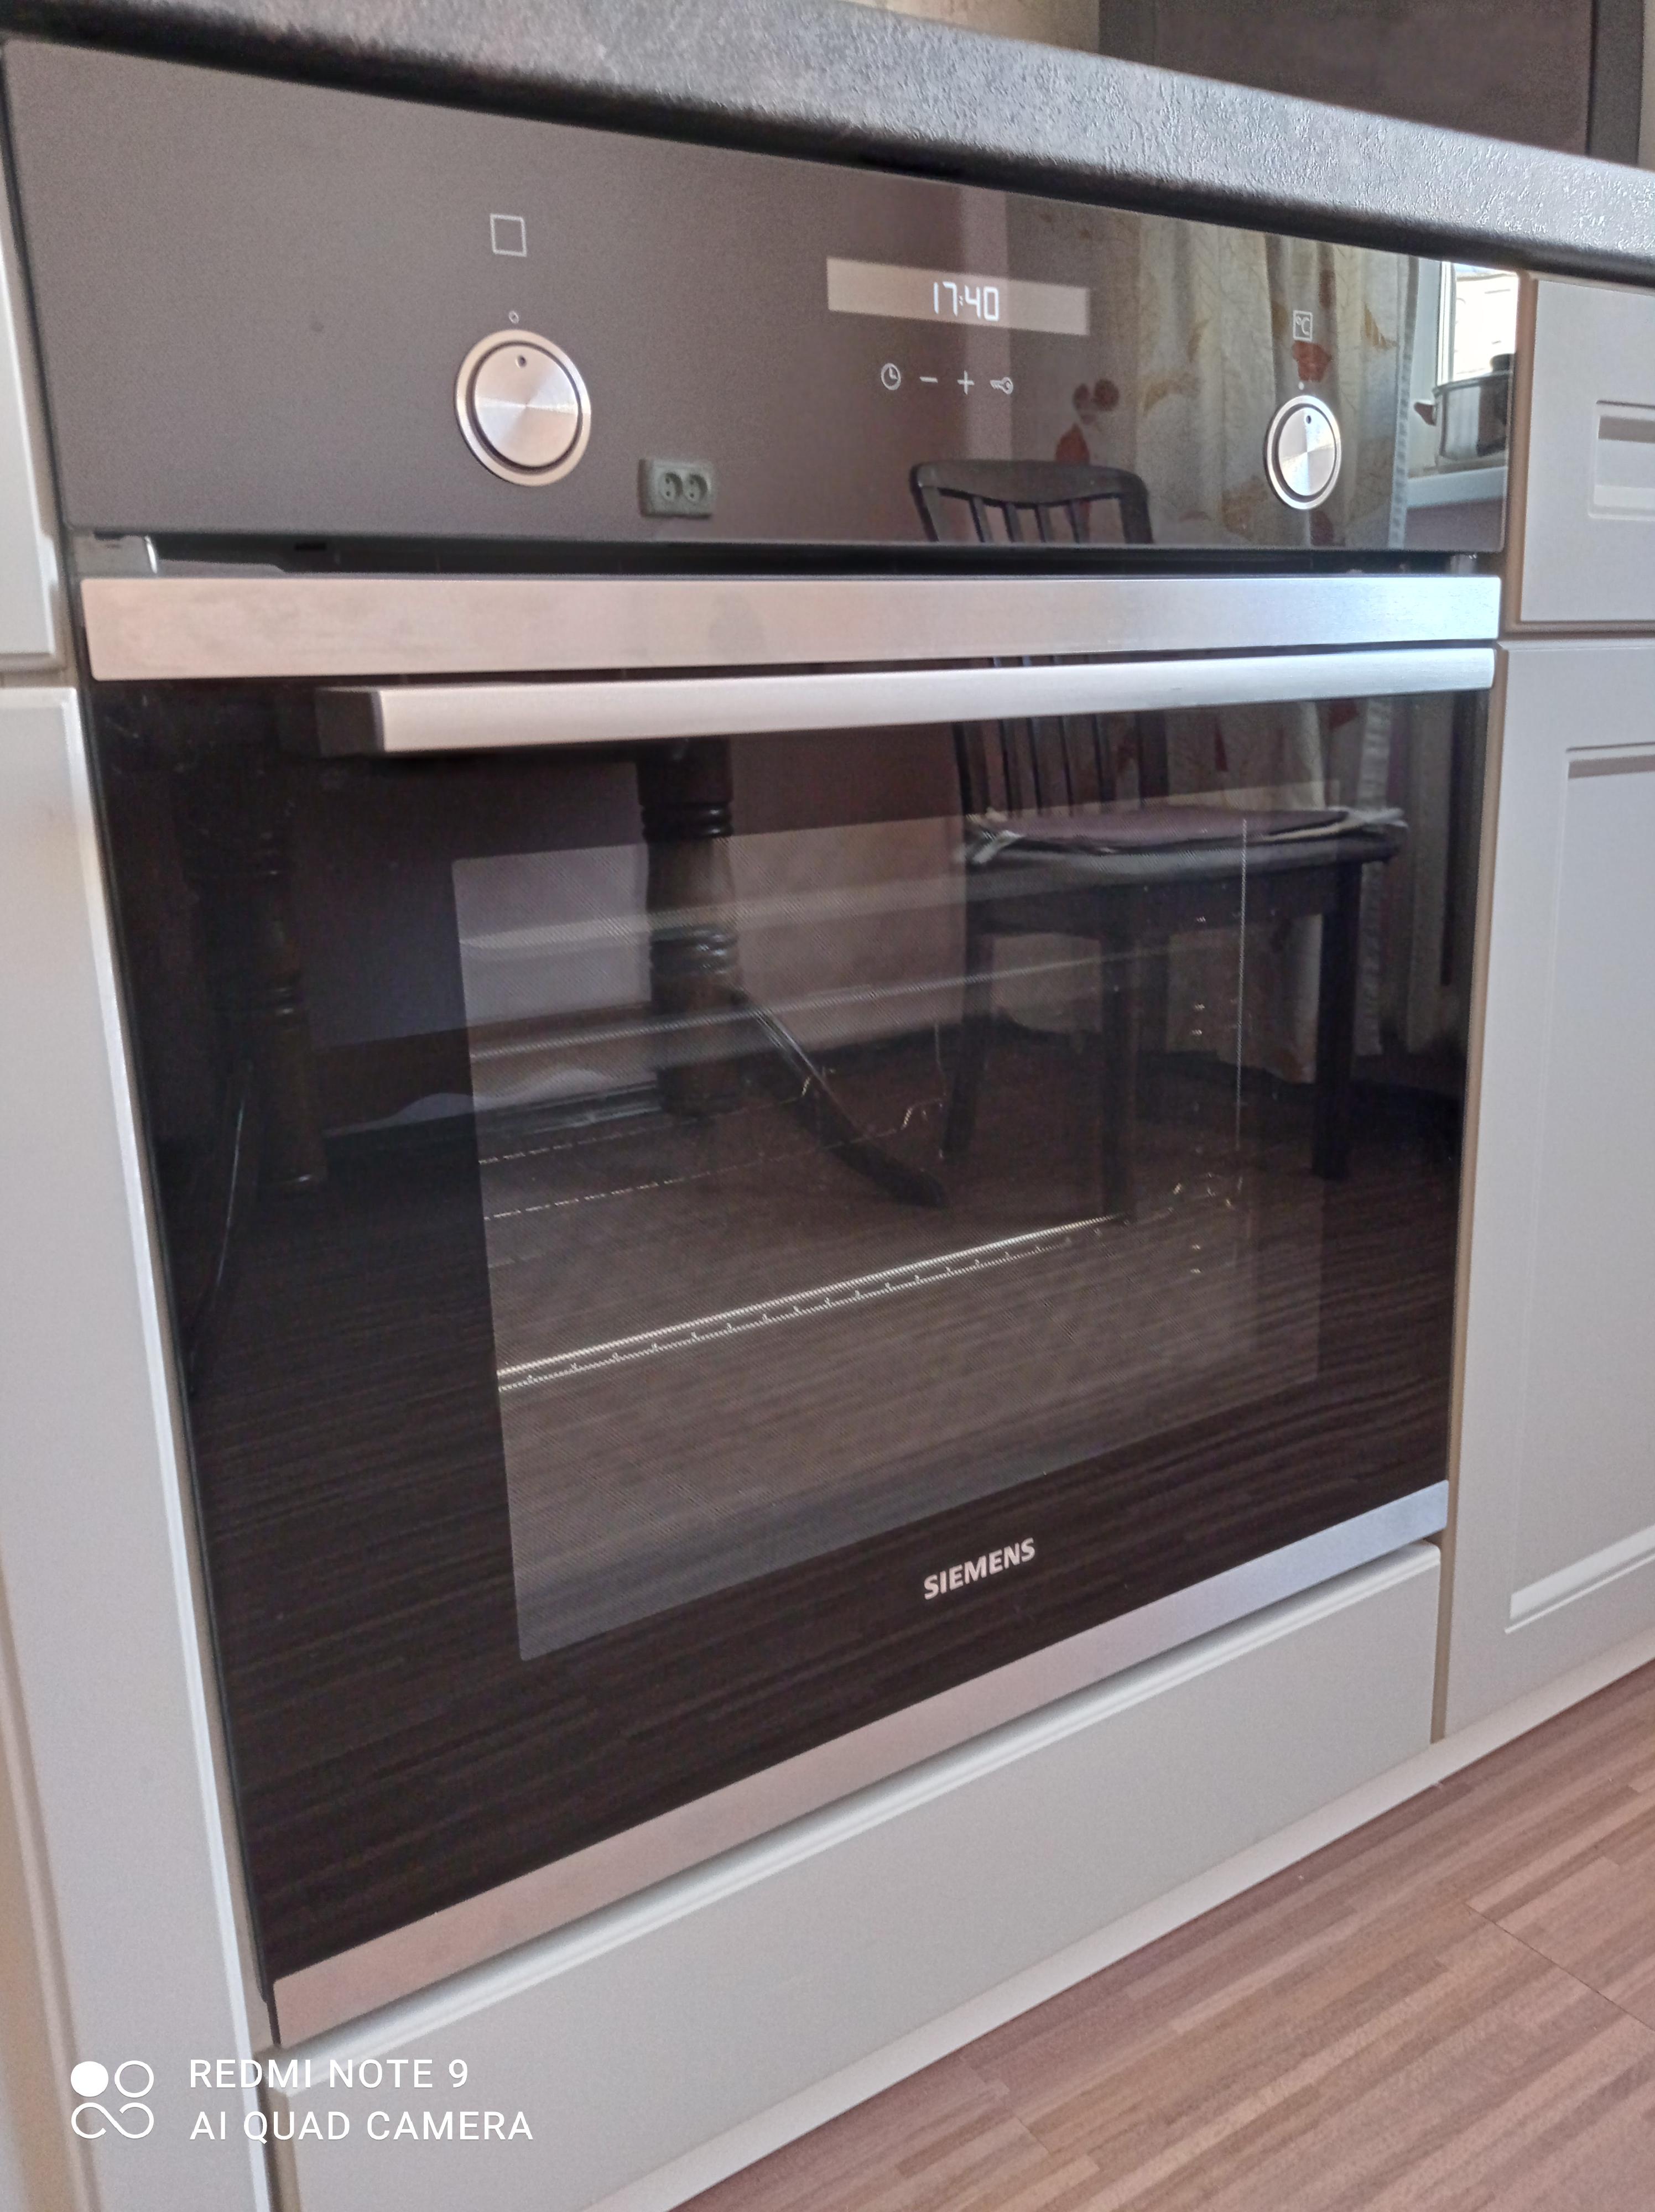 Обзор электрического духового шкафа Siemens iQ500 HB237JES0R